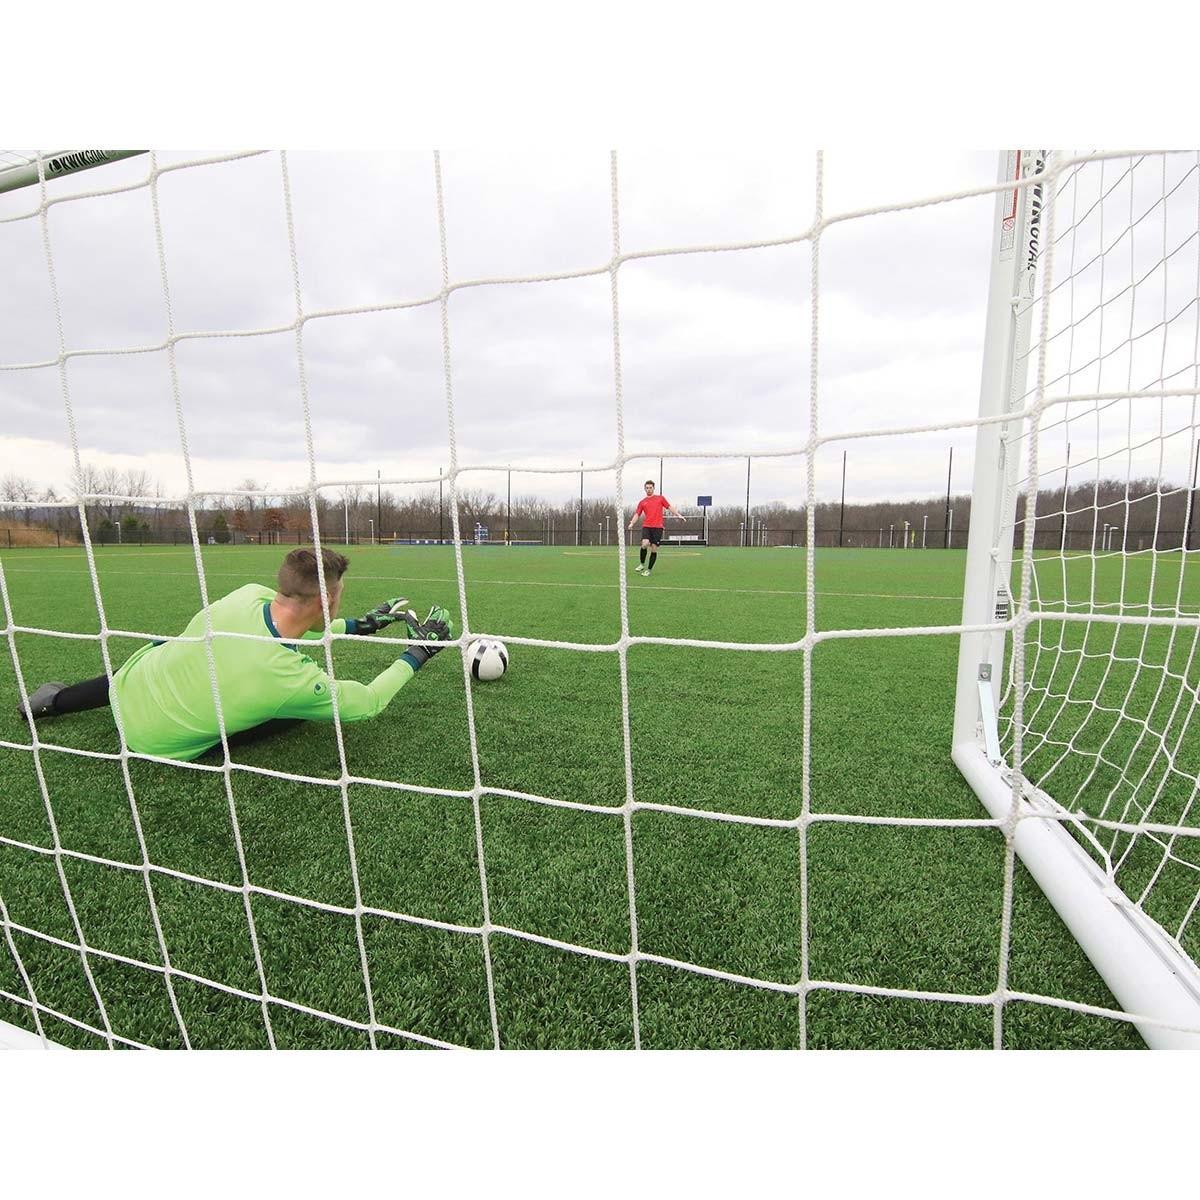 af574ff24 Kwik Goal 8'x24' Deluxe European Club Soccer Goal, 2B3006 - A12-545